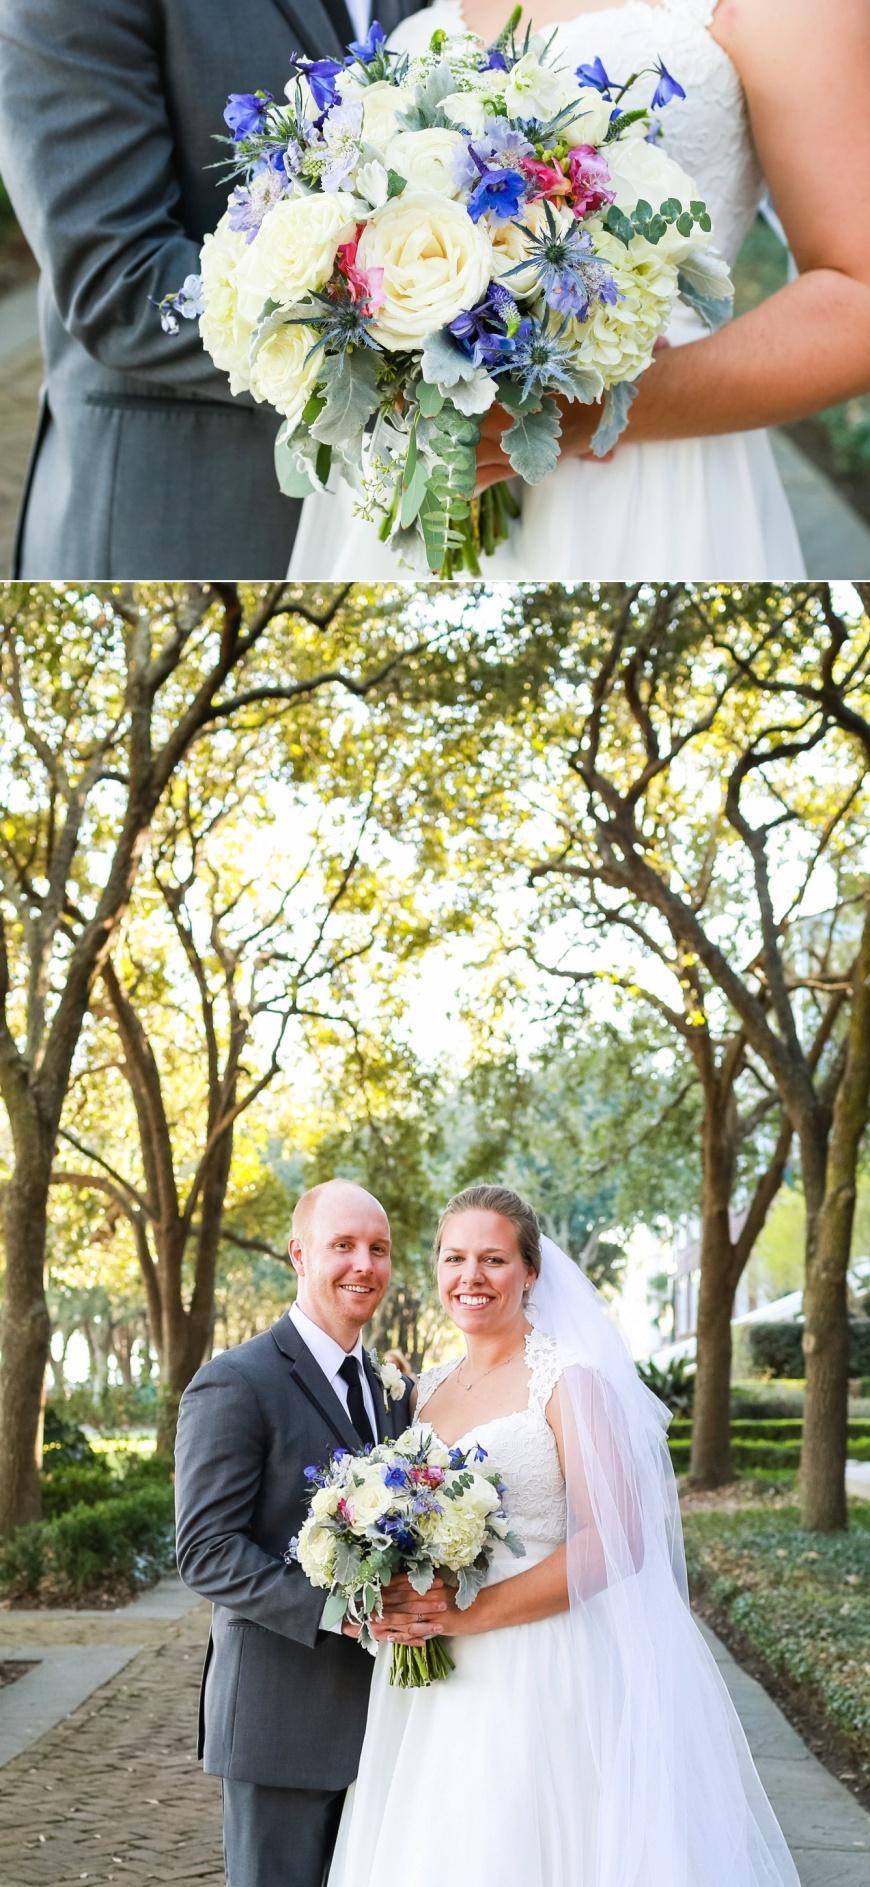 Charleston-Gaillard-Center-Wedding-Photographer_1076.jpg